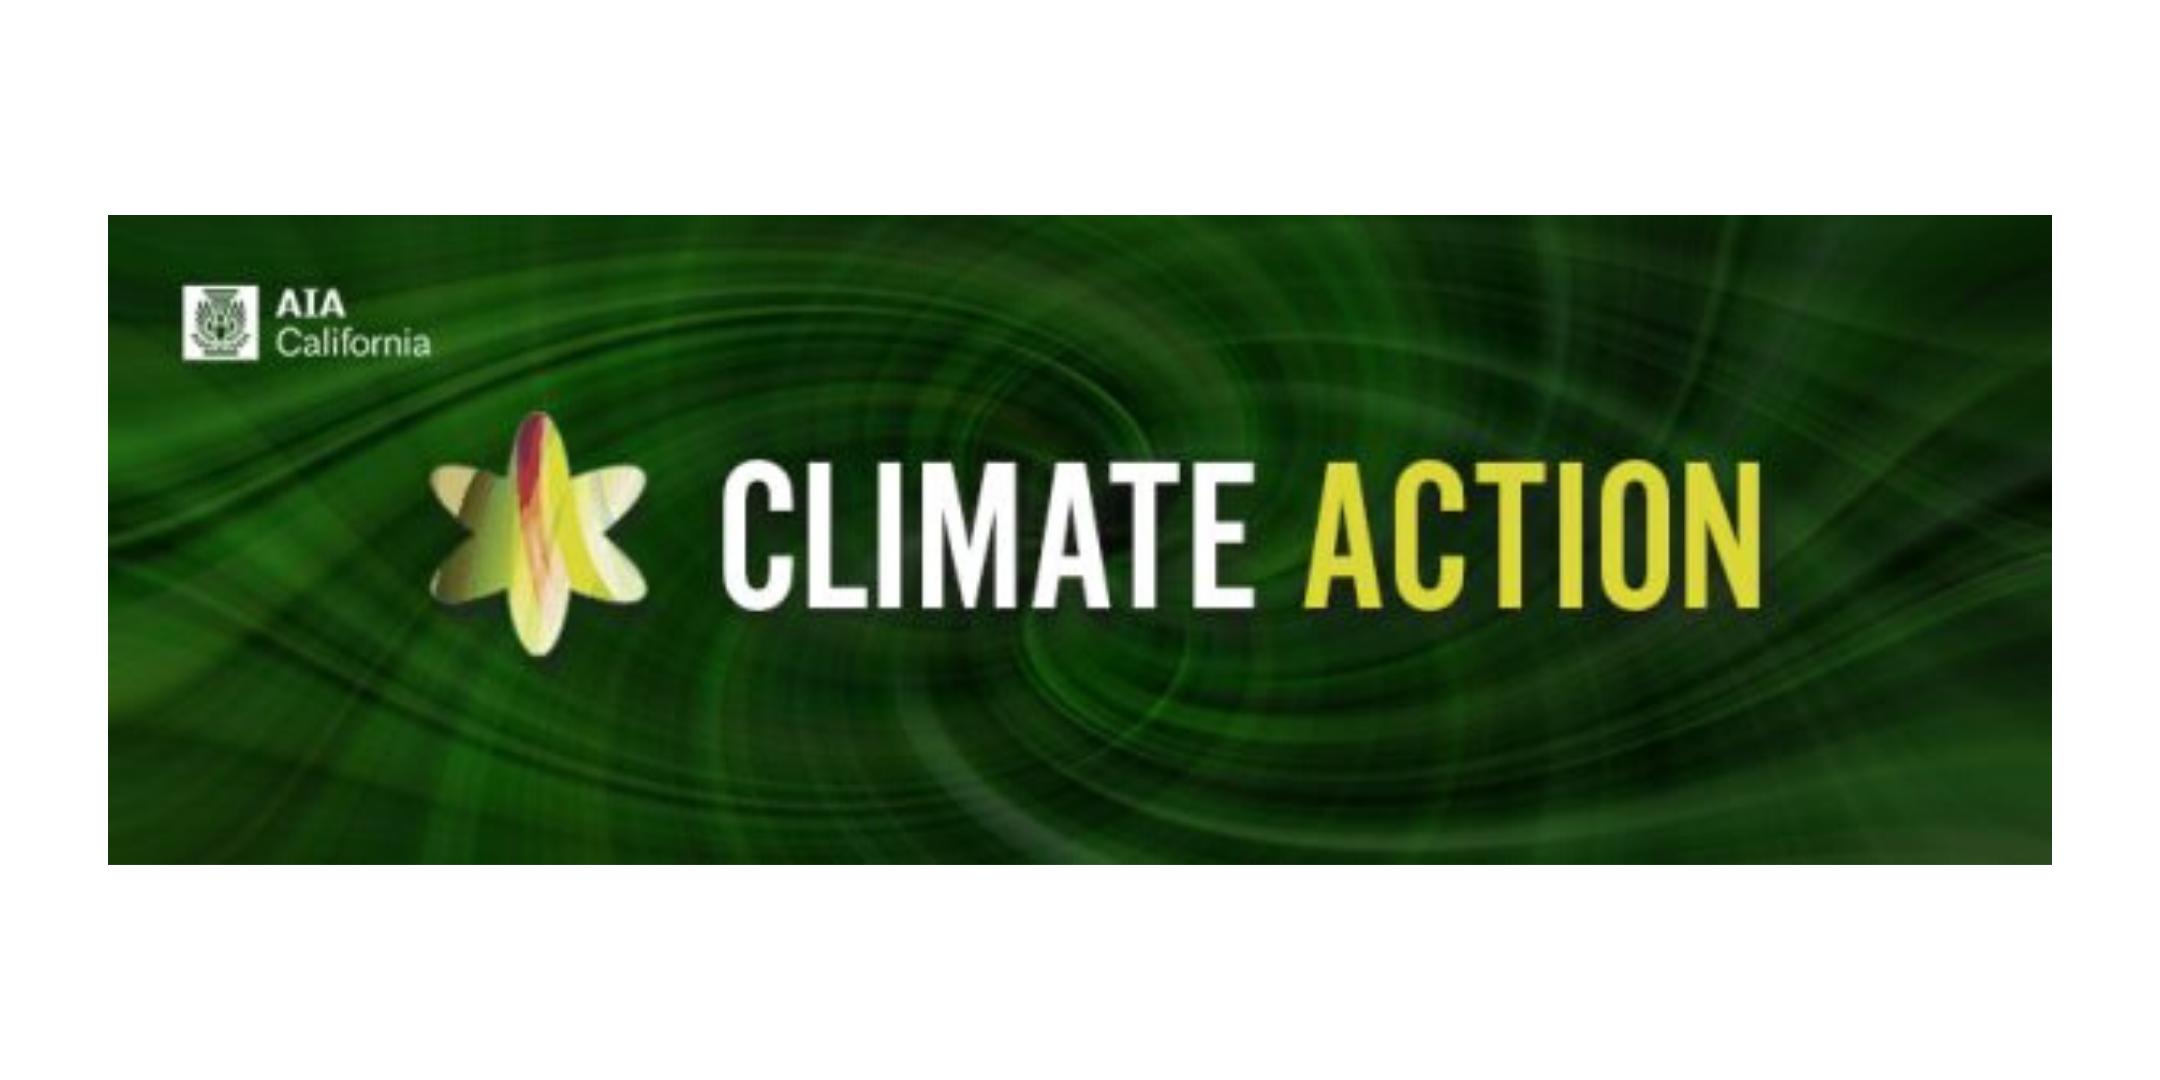 AIA California Climate Action